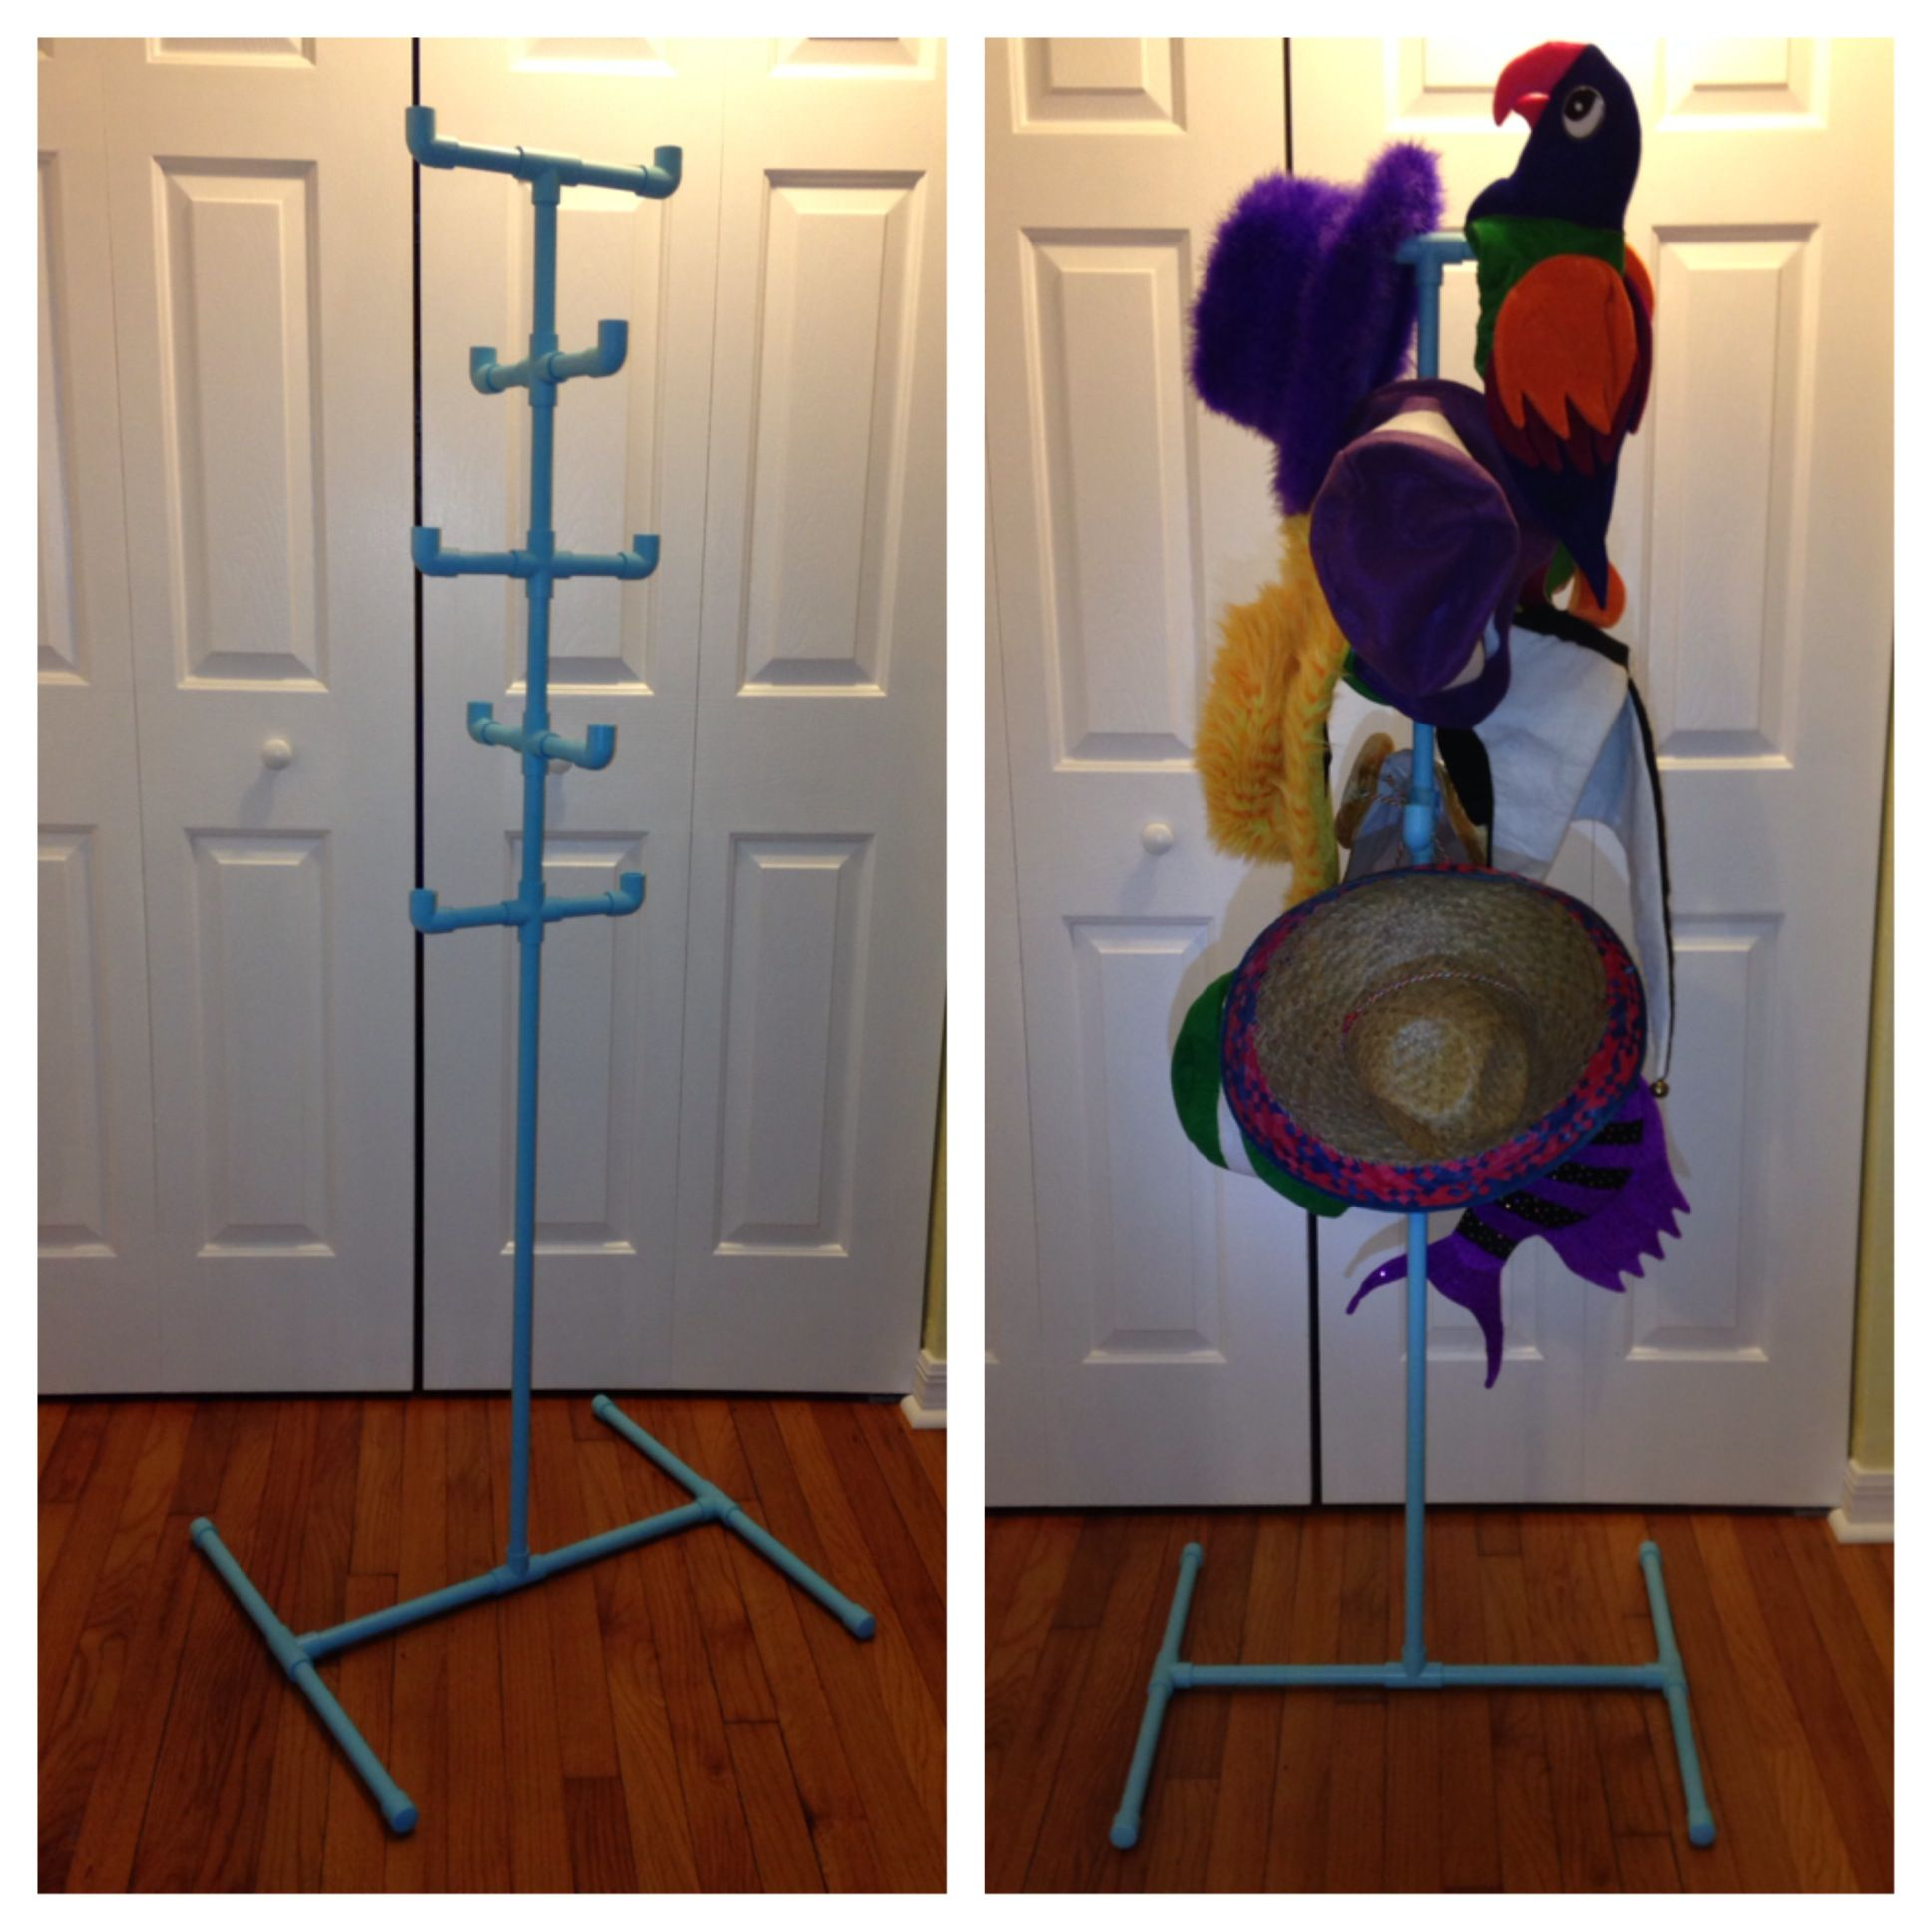 Photo Booth Display - PVC Hat Rack